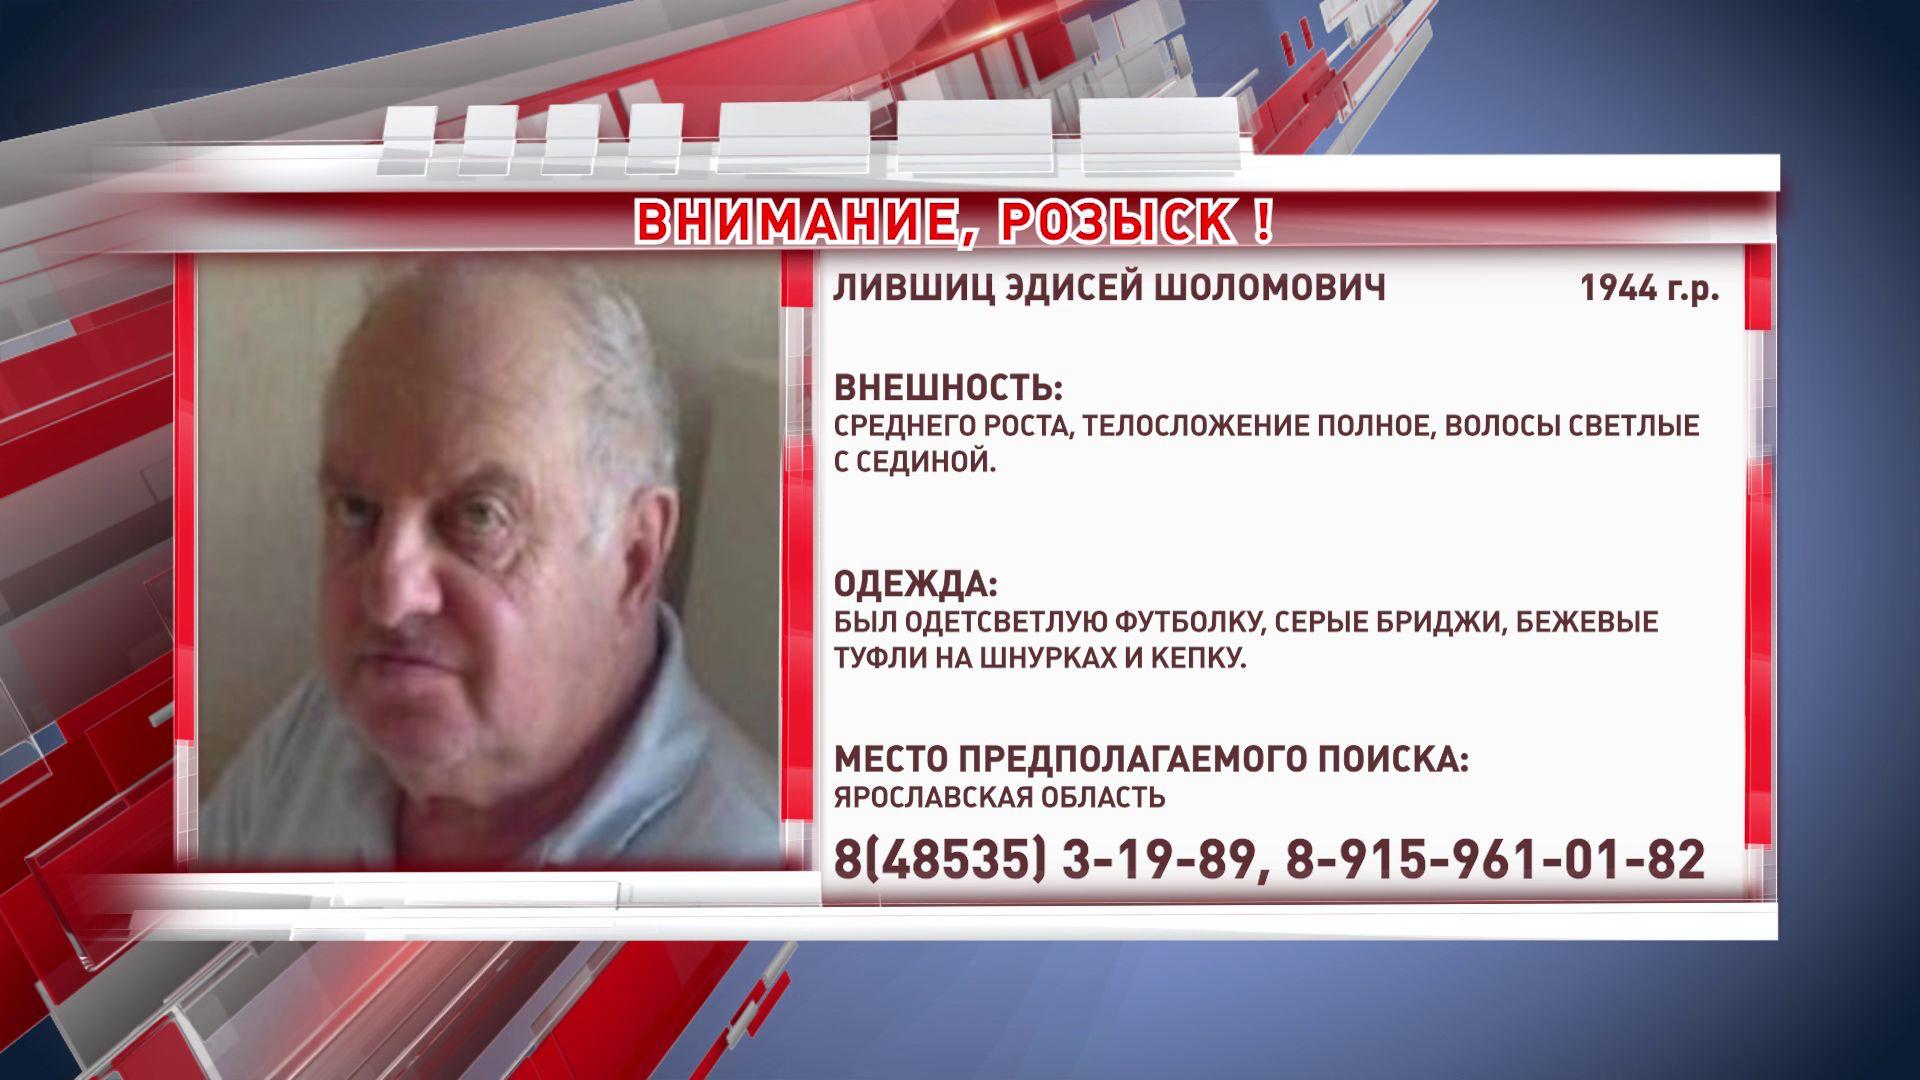 В Ярославле пропал 76-летний мужчина